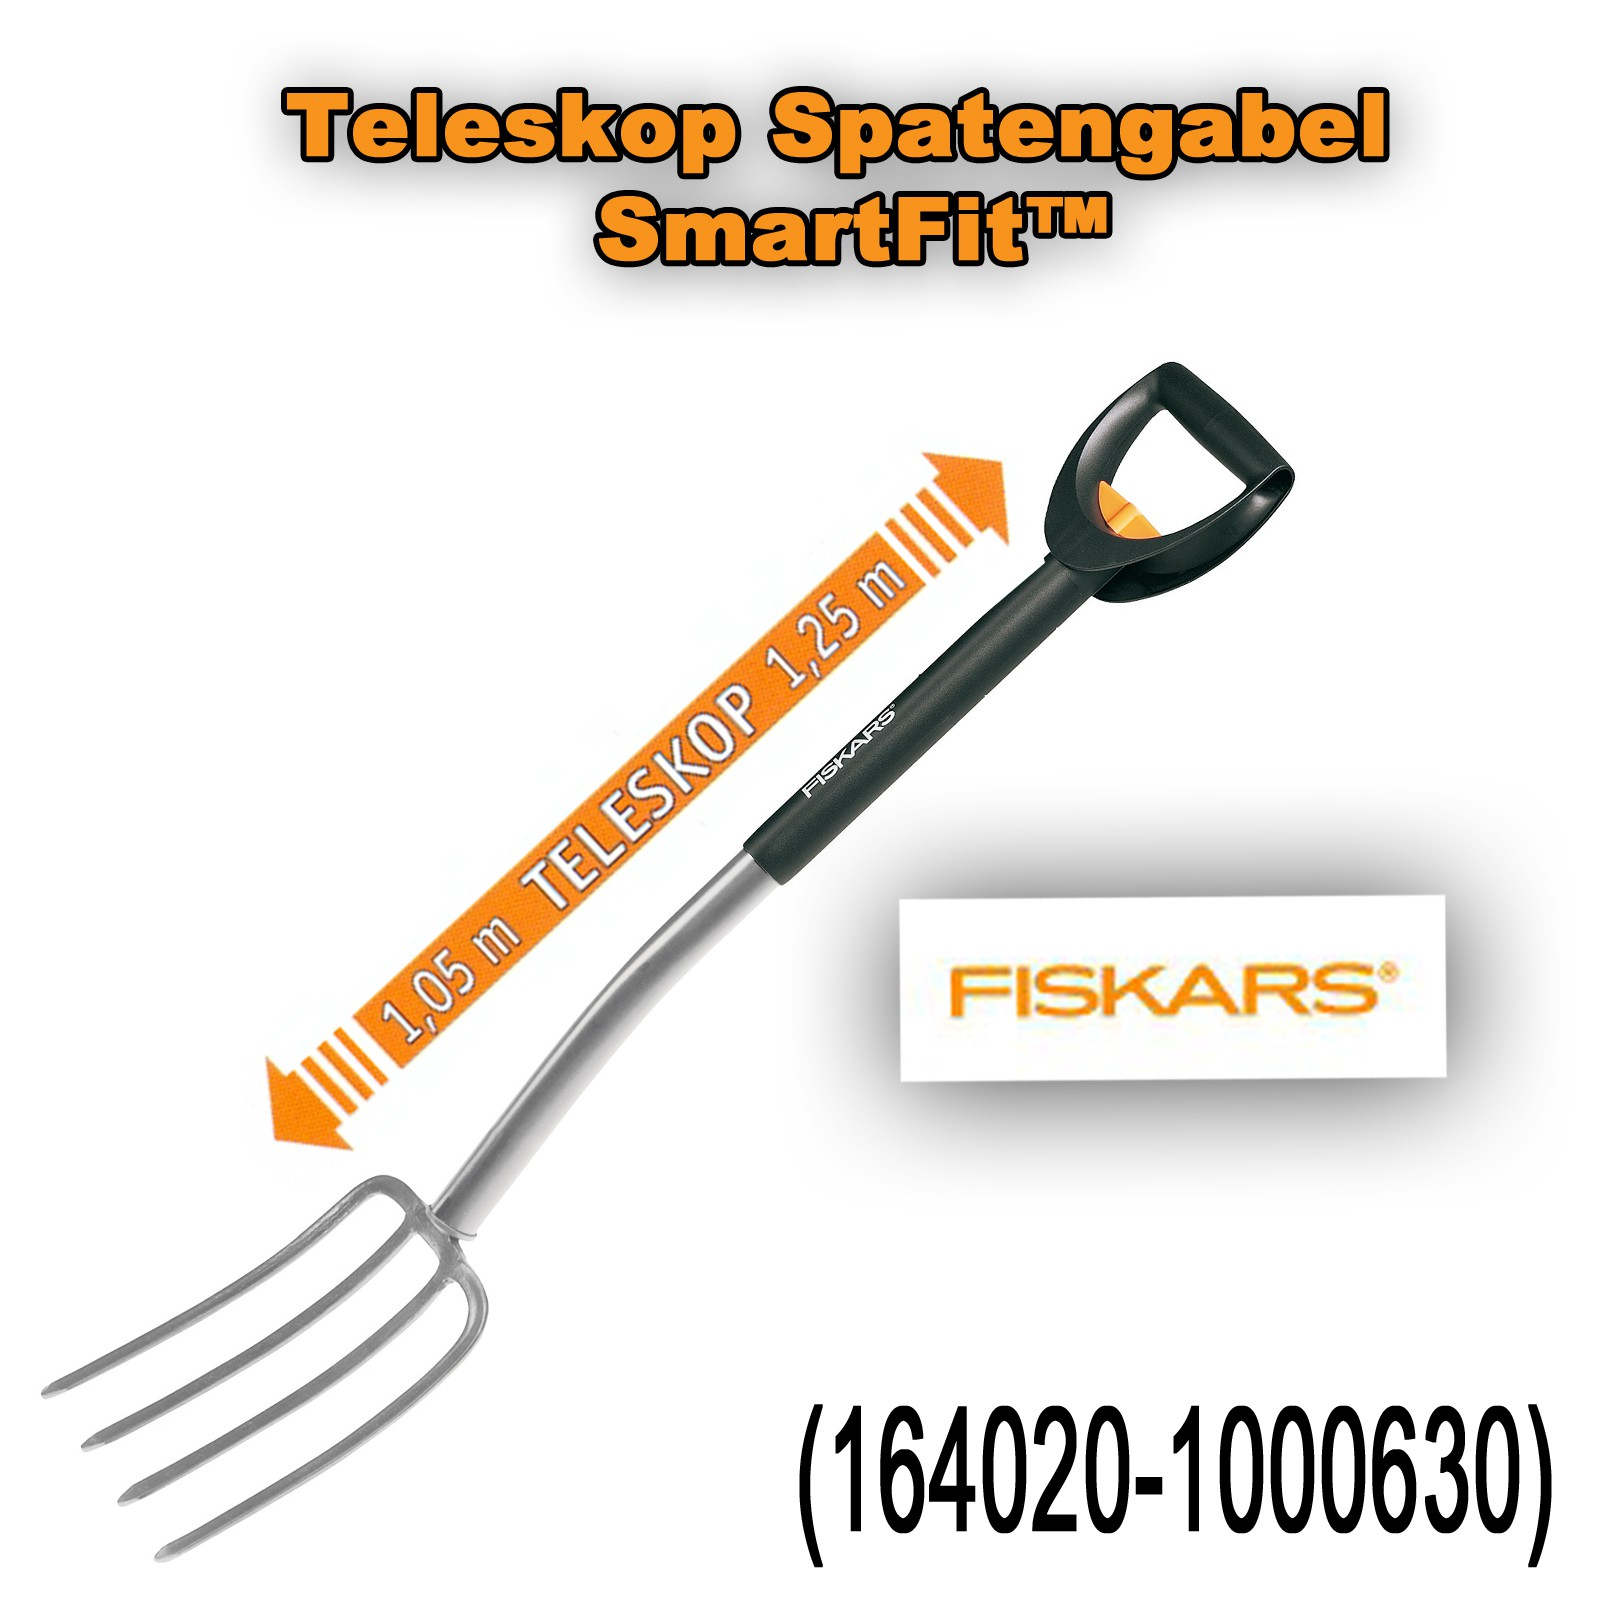 Fiskars Garten Spaten Grabgabeln SmartFit™ Ergonomic™ Auswahl 1000630